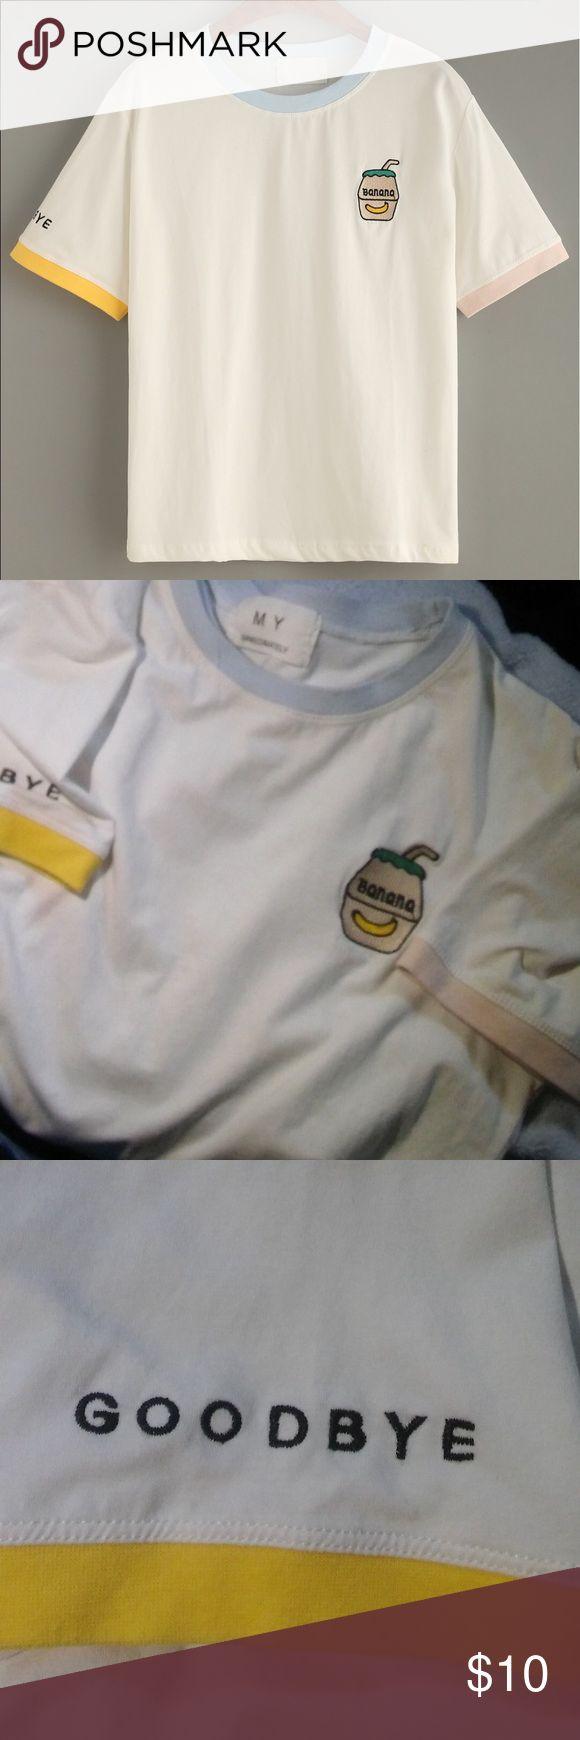 Banana milk shirt🍌 - like new  - only worn few times - clean  - fresh fabric  - stretchy  - cute   Tags: banana , milk , kawaii , shirt , Korean , fashion Tops Tees - Short Sleeve